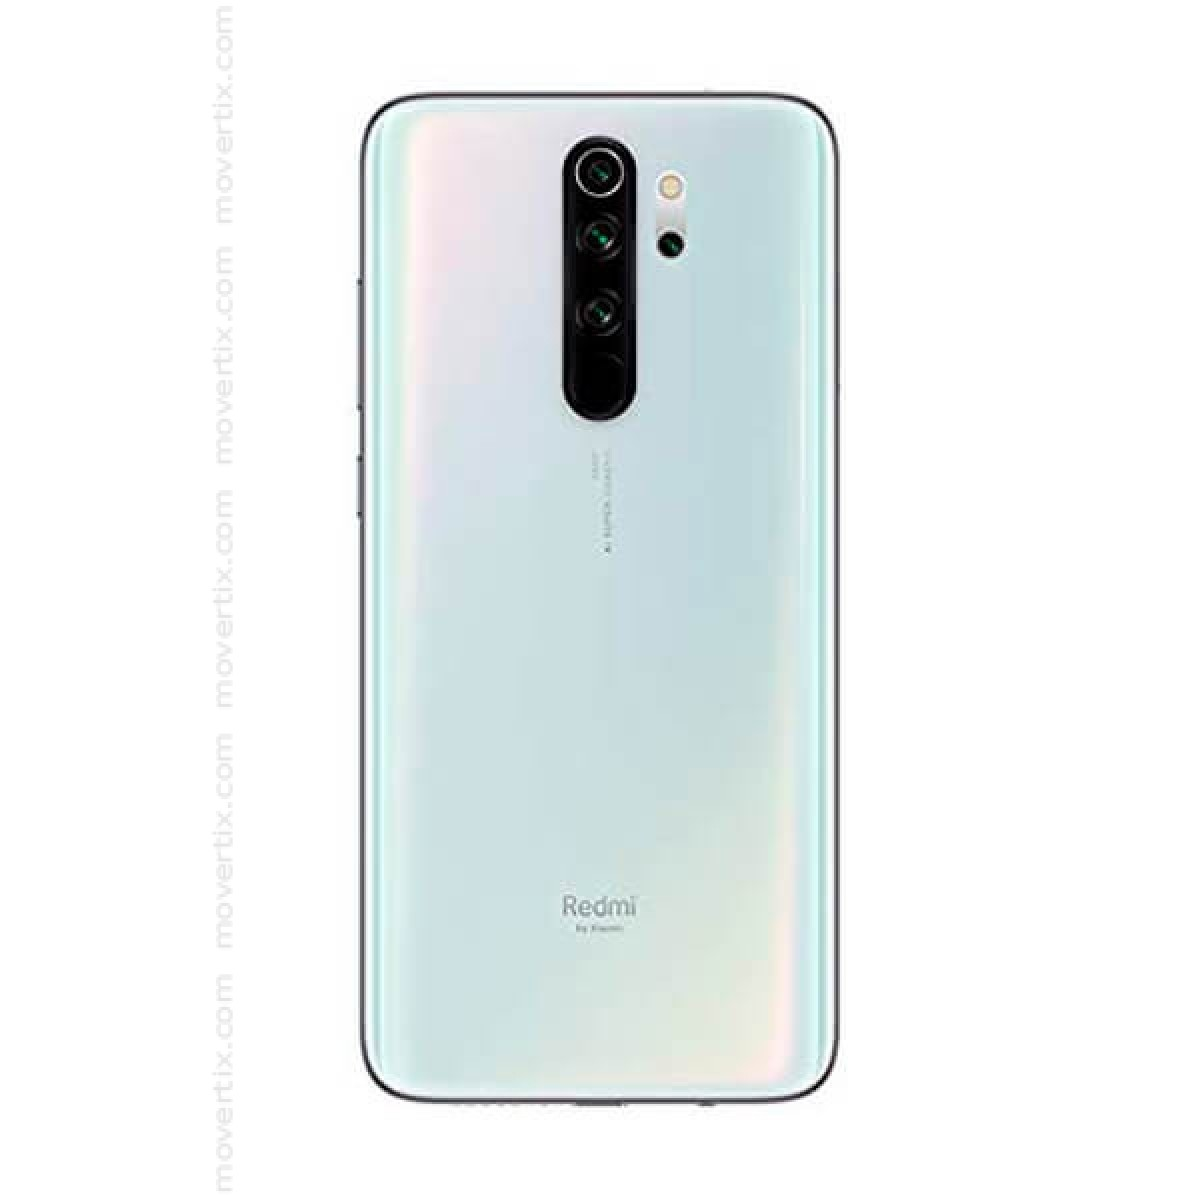 Xiaomi Redmi Note 8 Pro Dual Sim Pearl White 64gb And 6gb Ram 6941059634638 Movertix Mobile Phones Shop